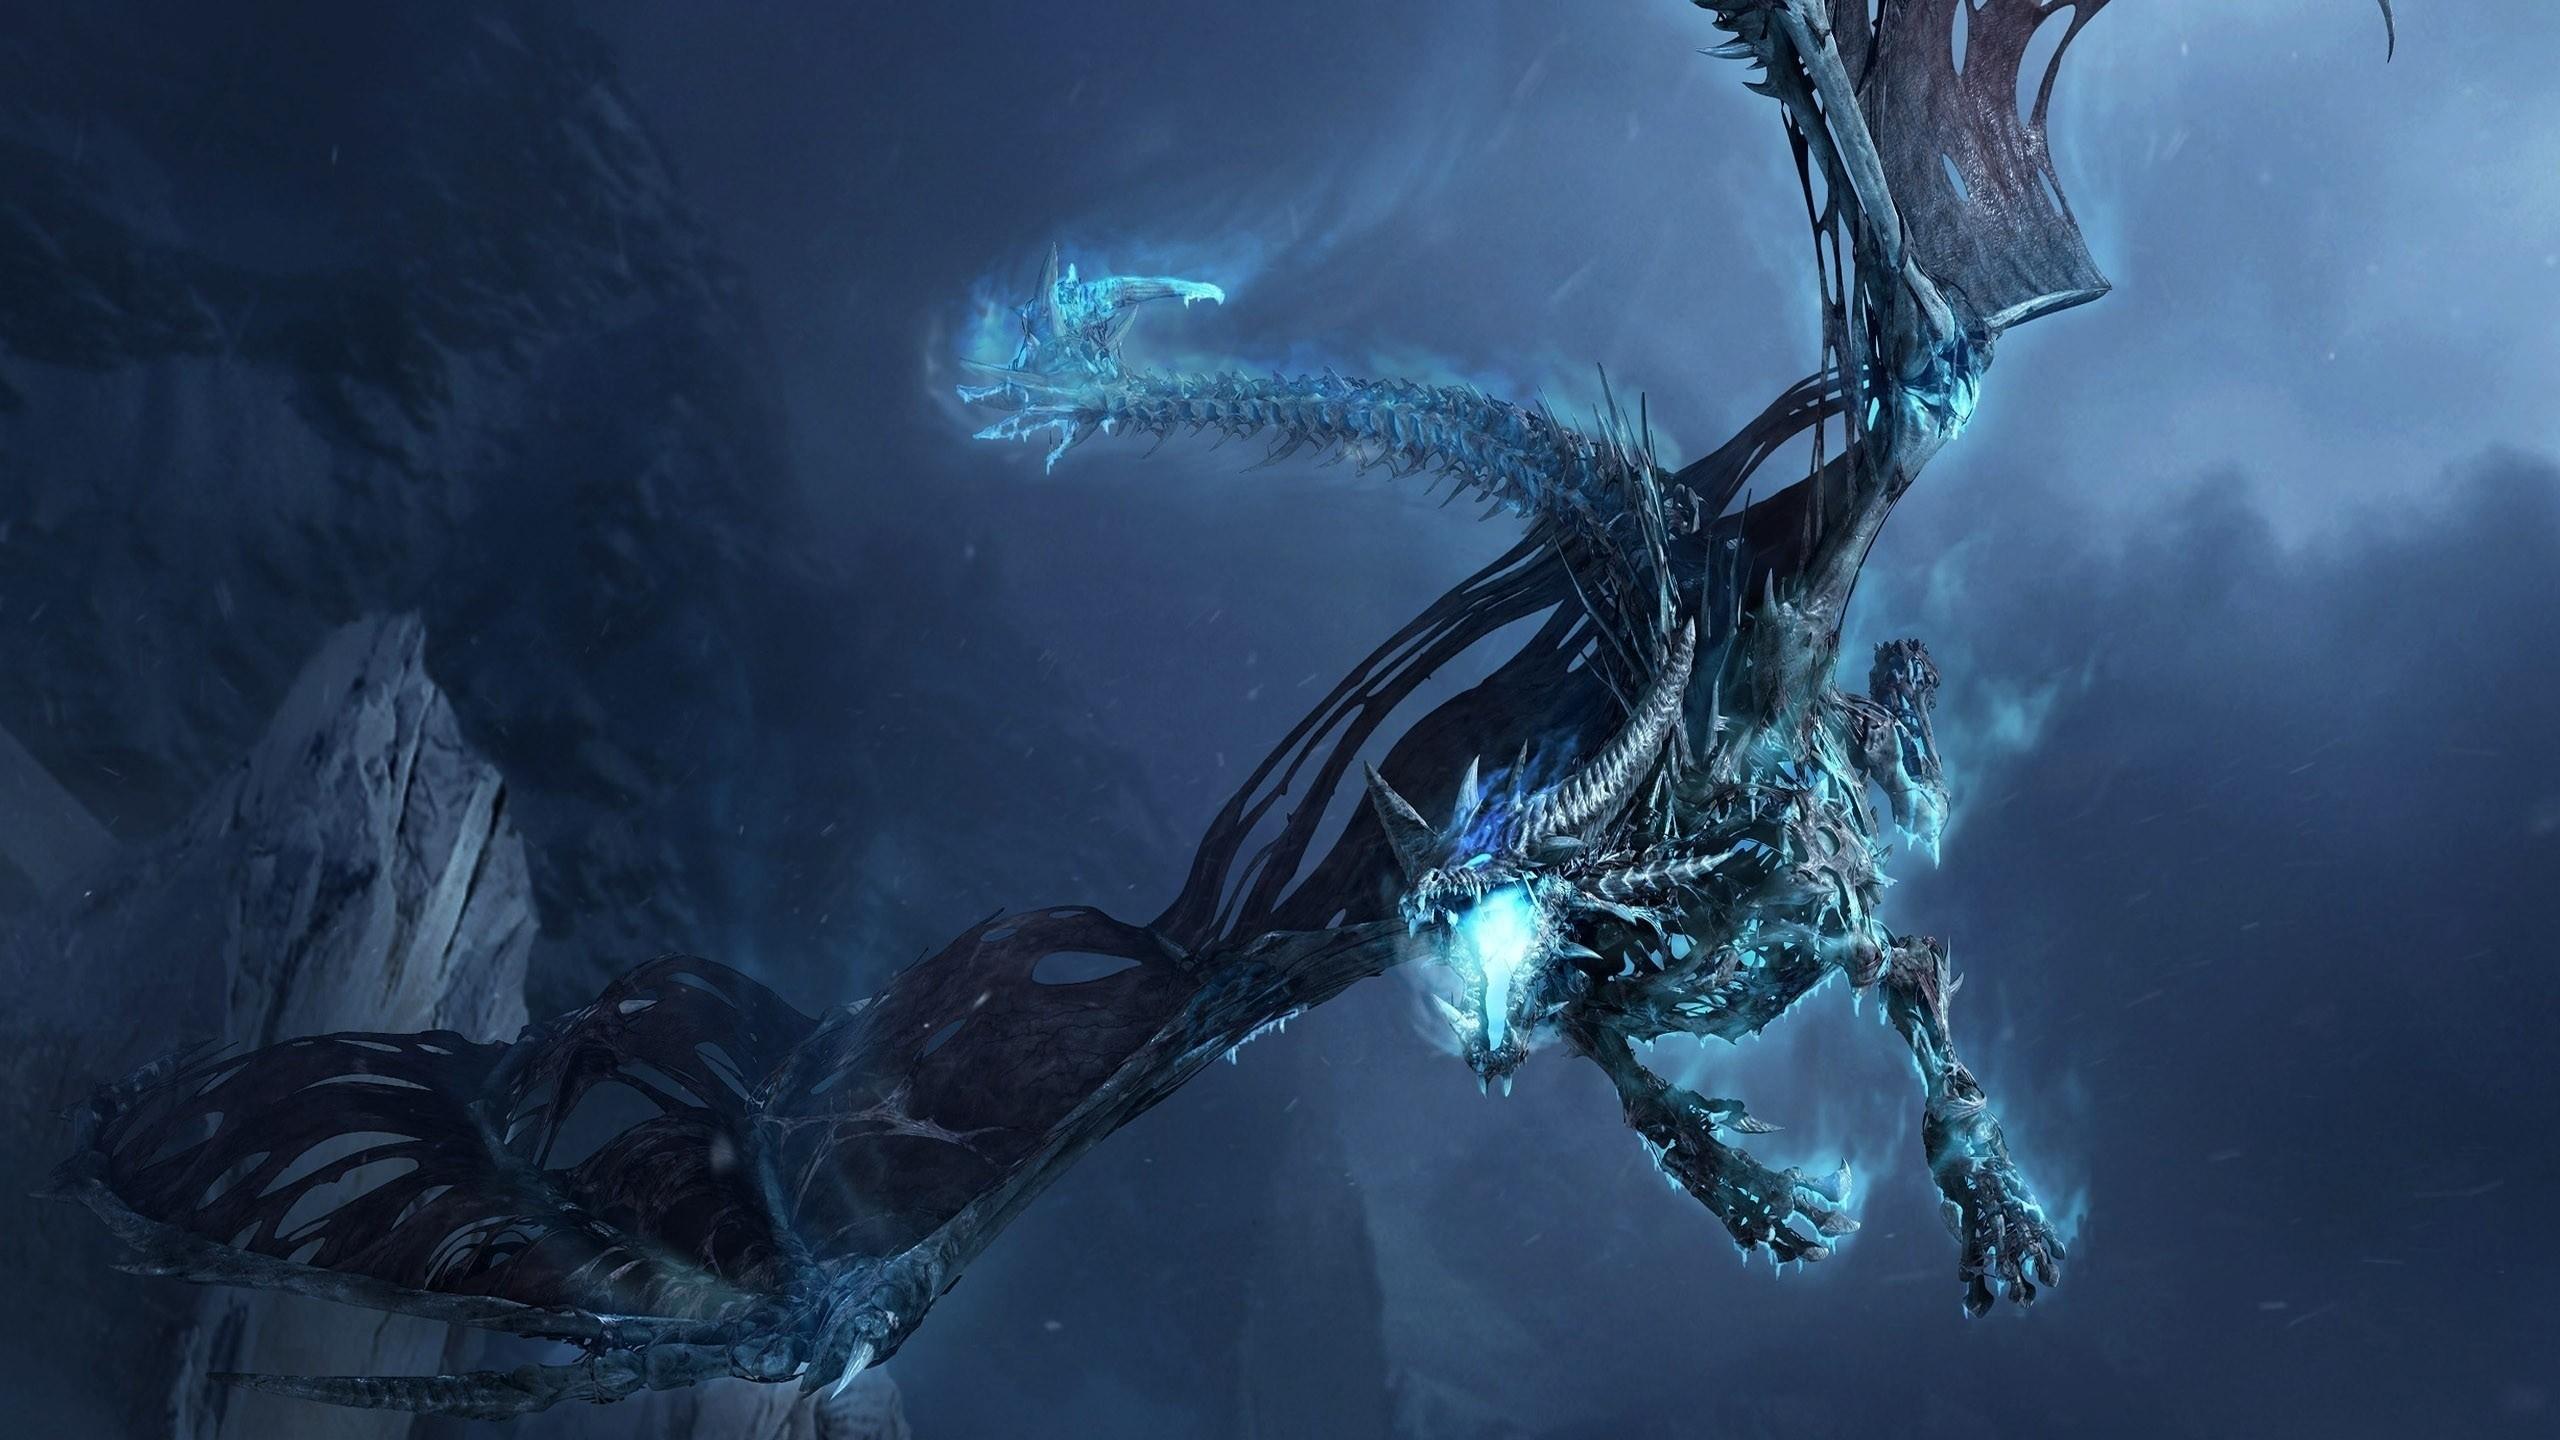 Wallpaper dragon, fly, jaws, rocks, night